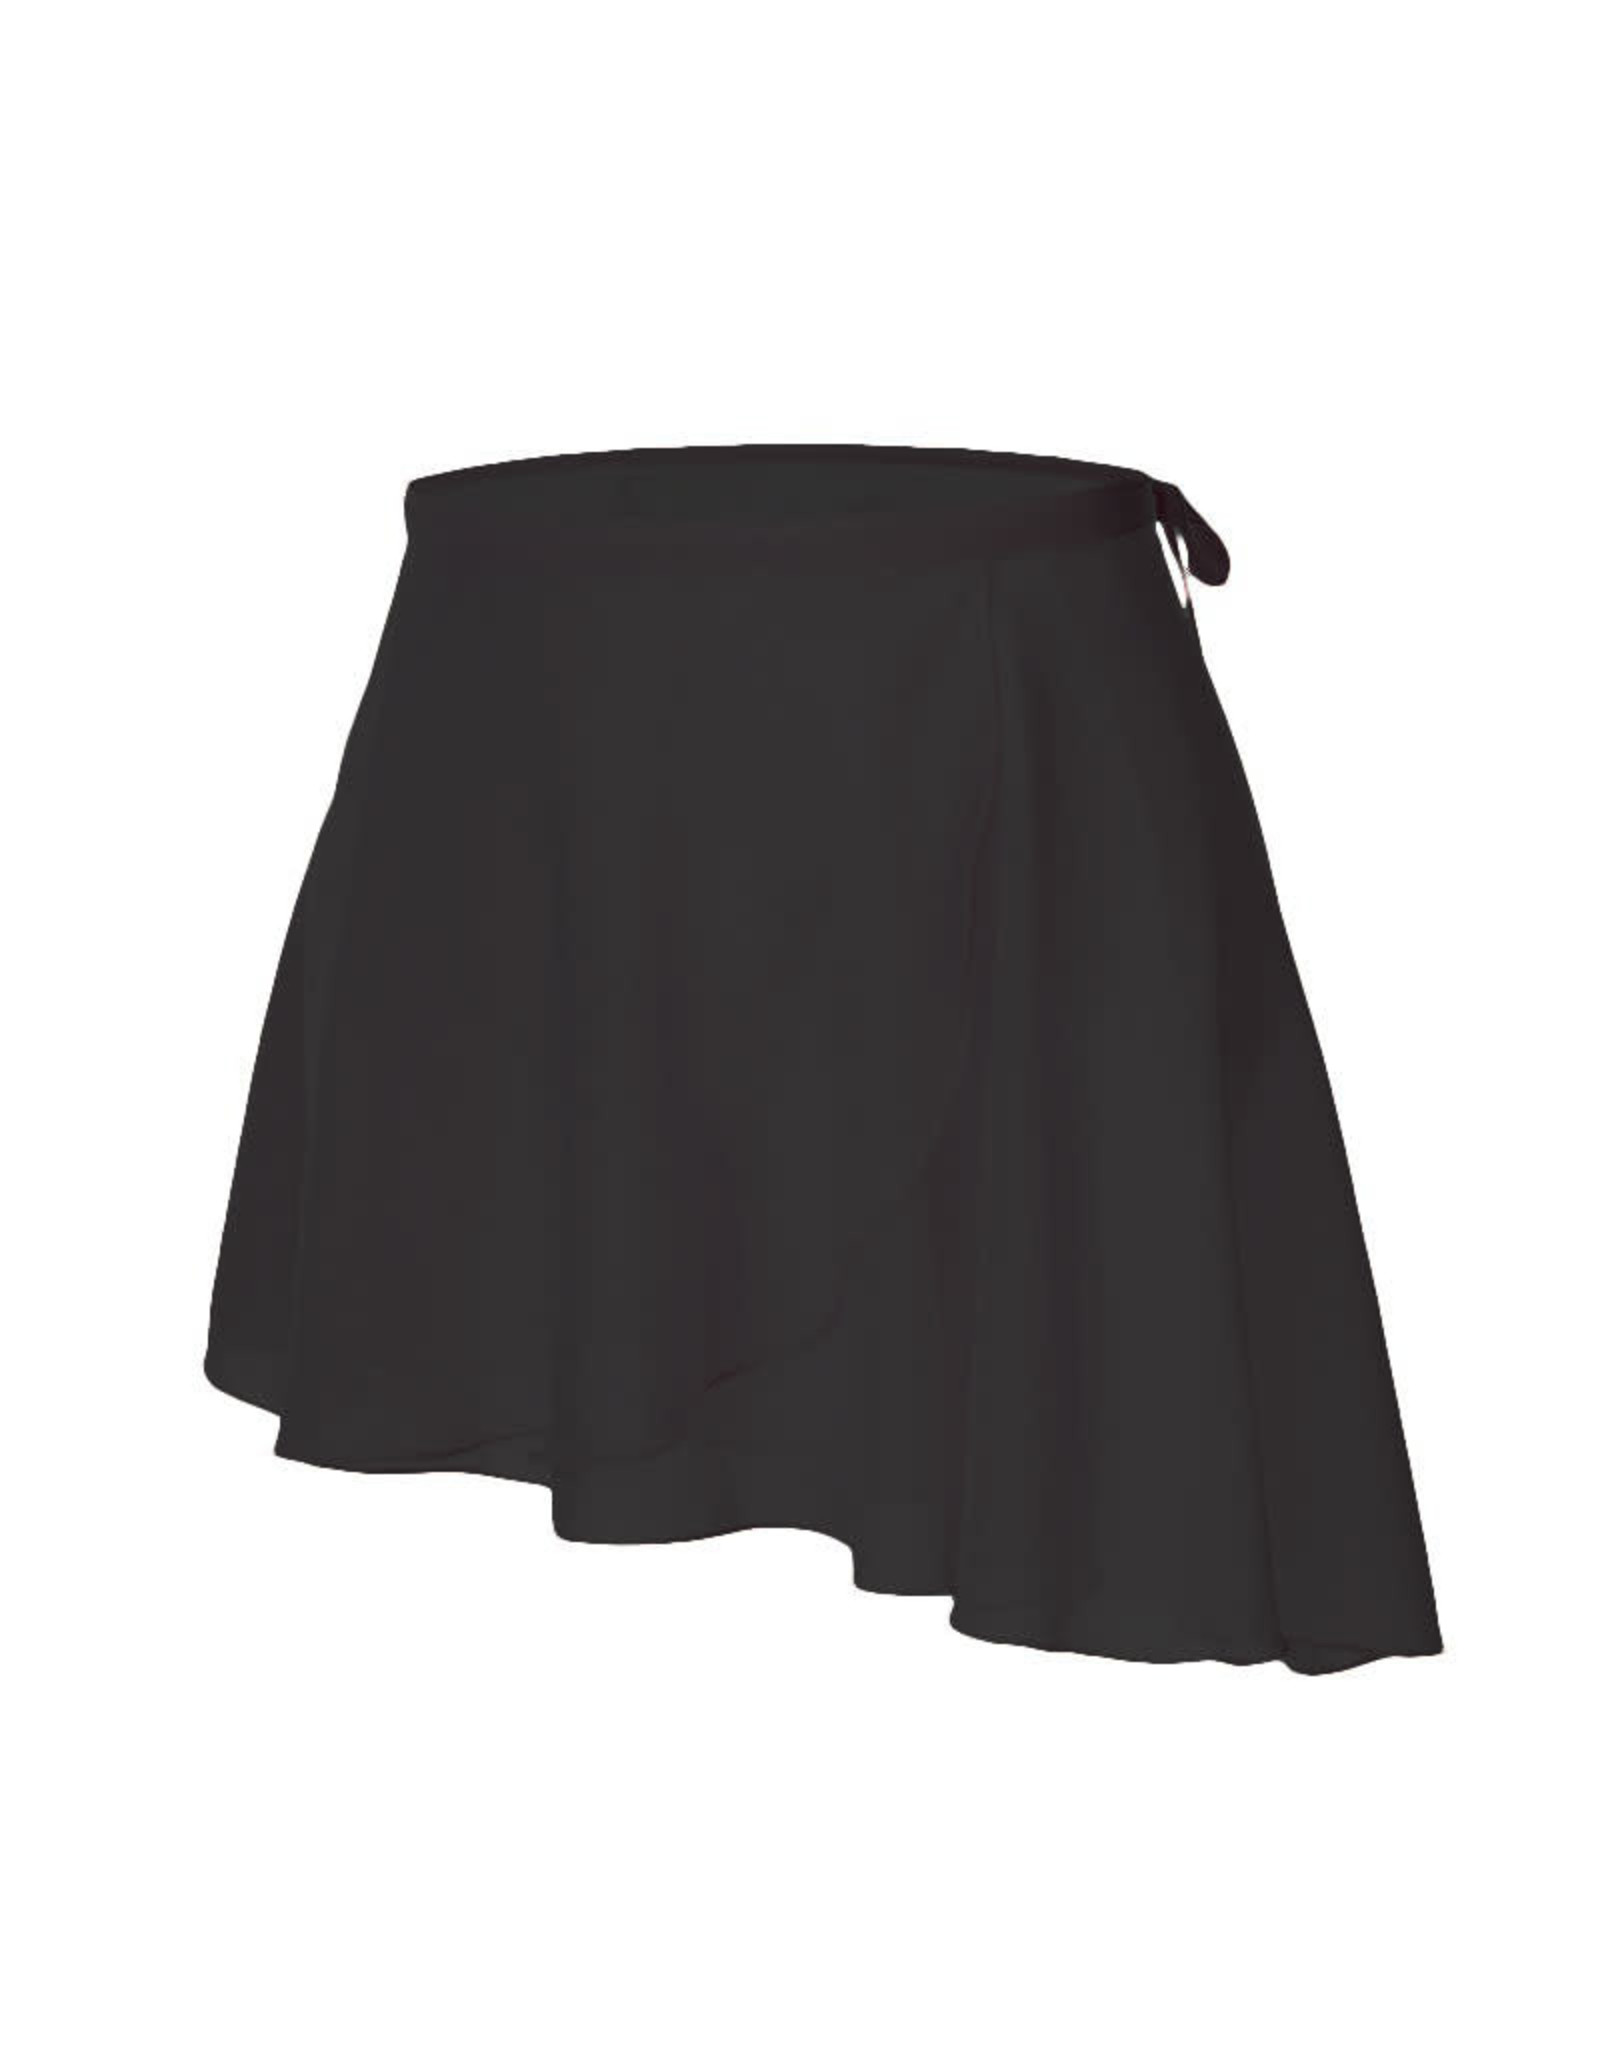 Sansha Zephyr Skirt D071P